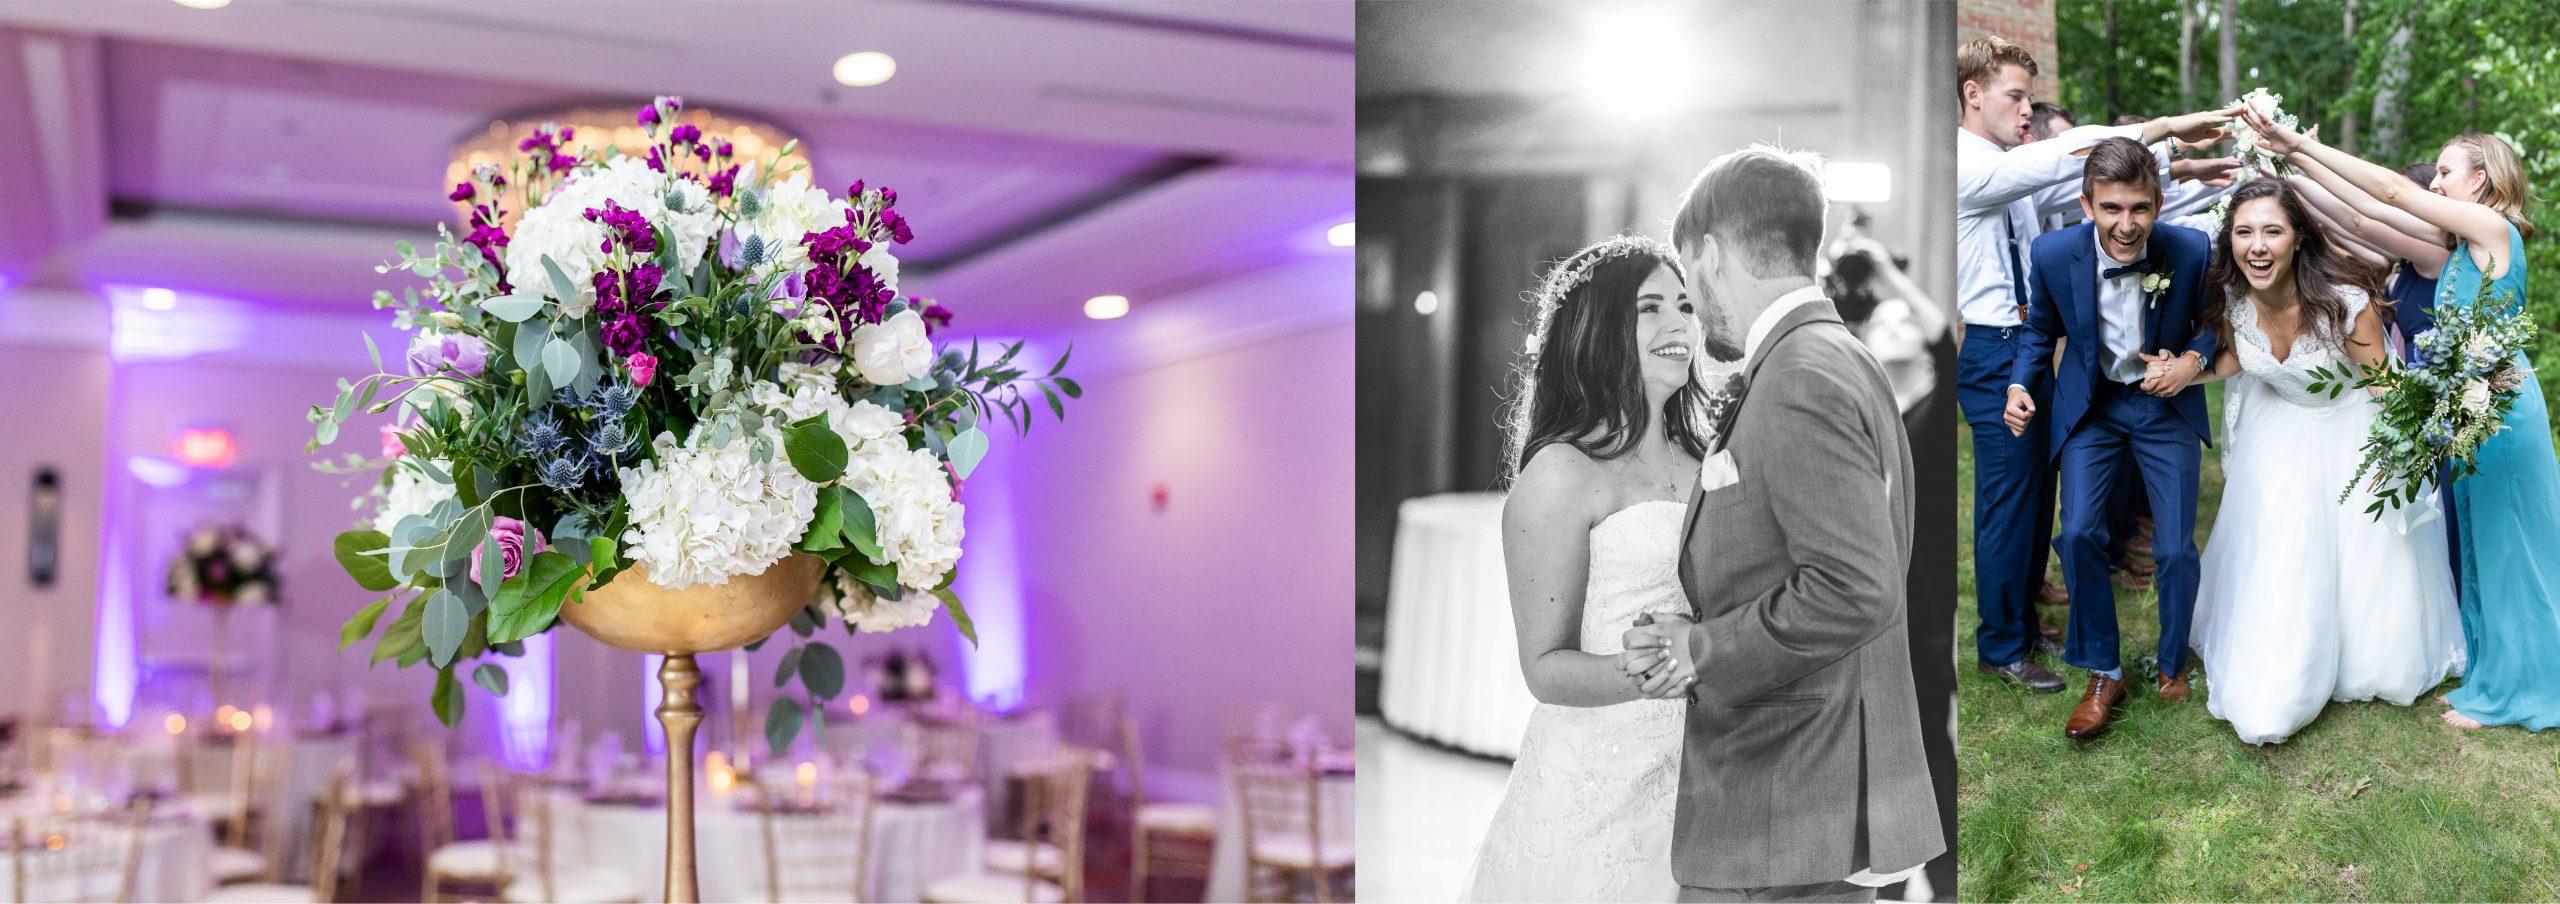 kandra-lynn-photography-michigan-wedding-photographer-07